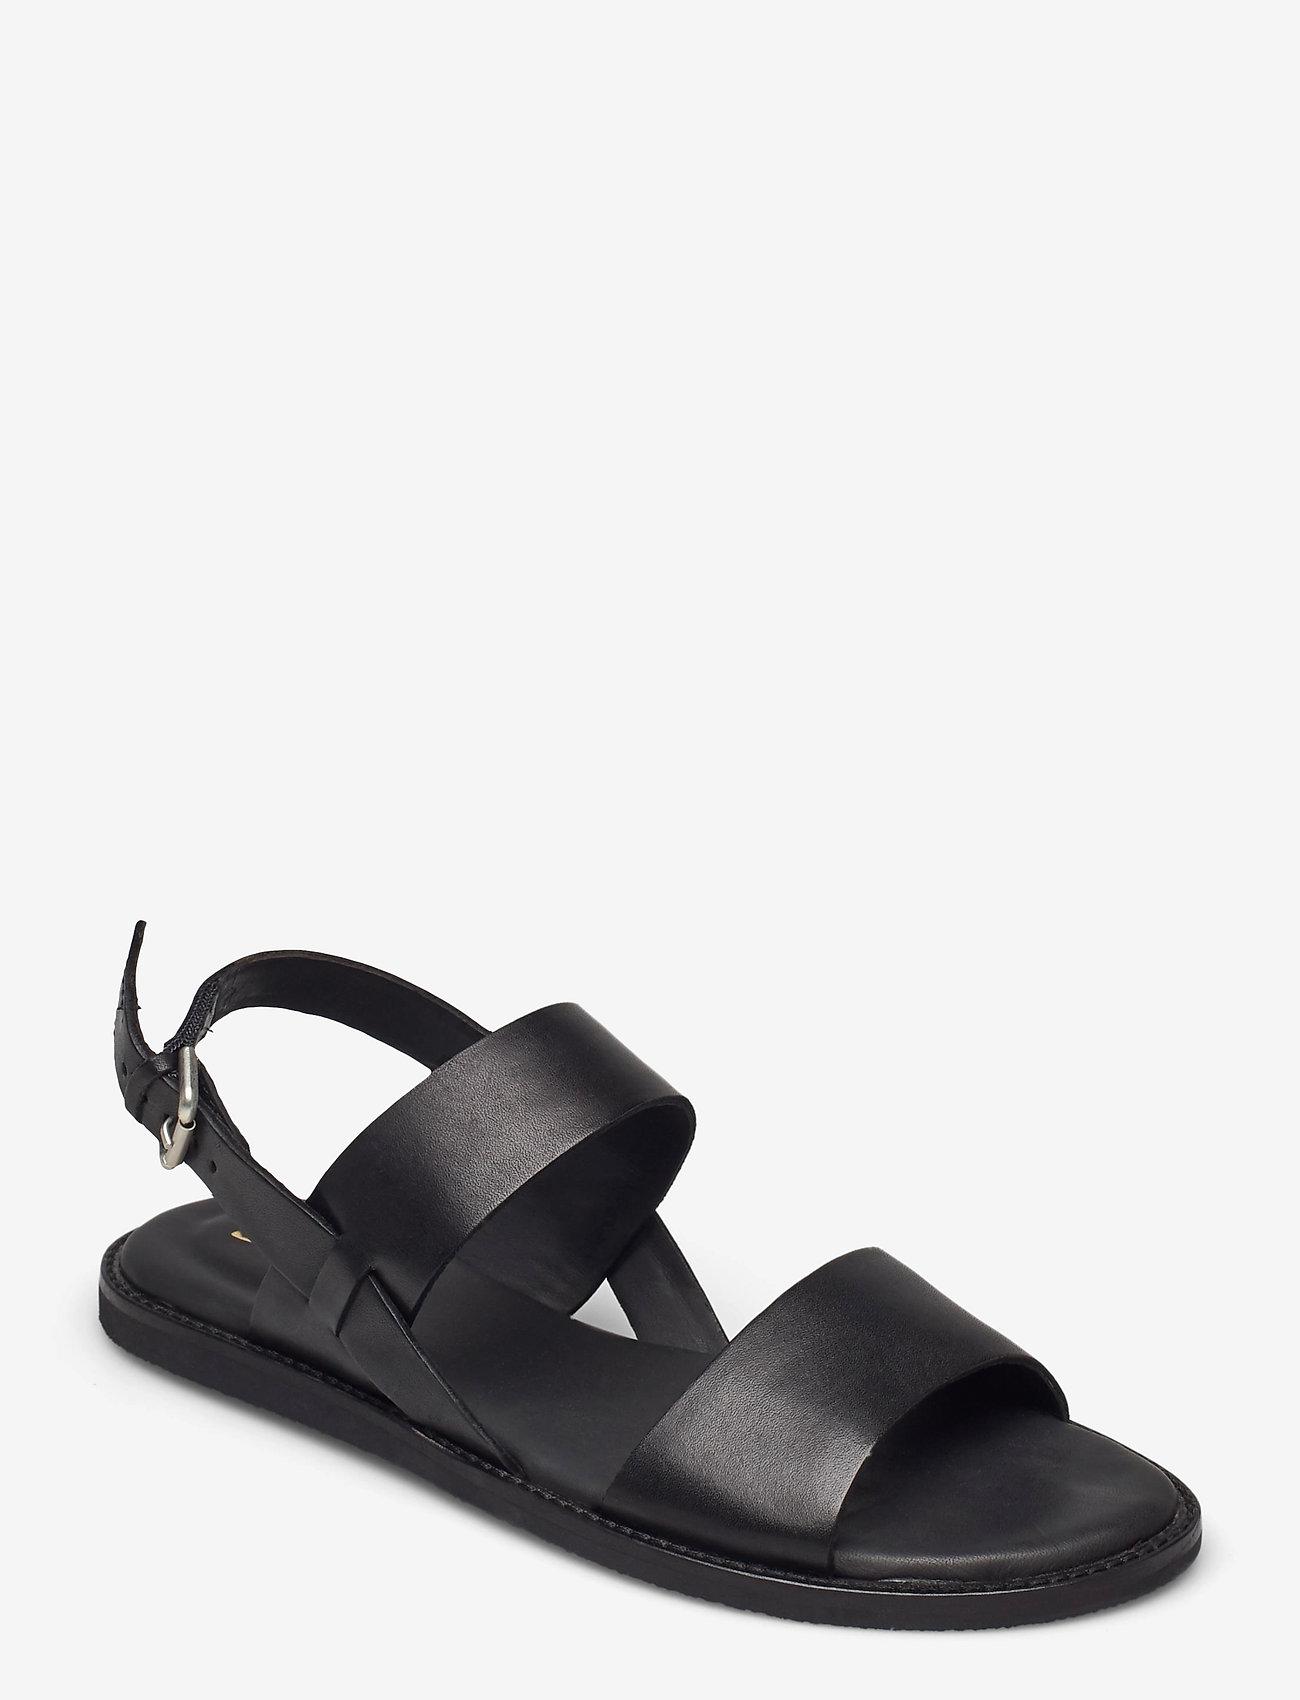 Clarks - Karsea Strap - platta sandaler - black leather - 0